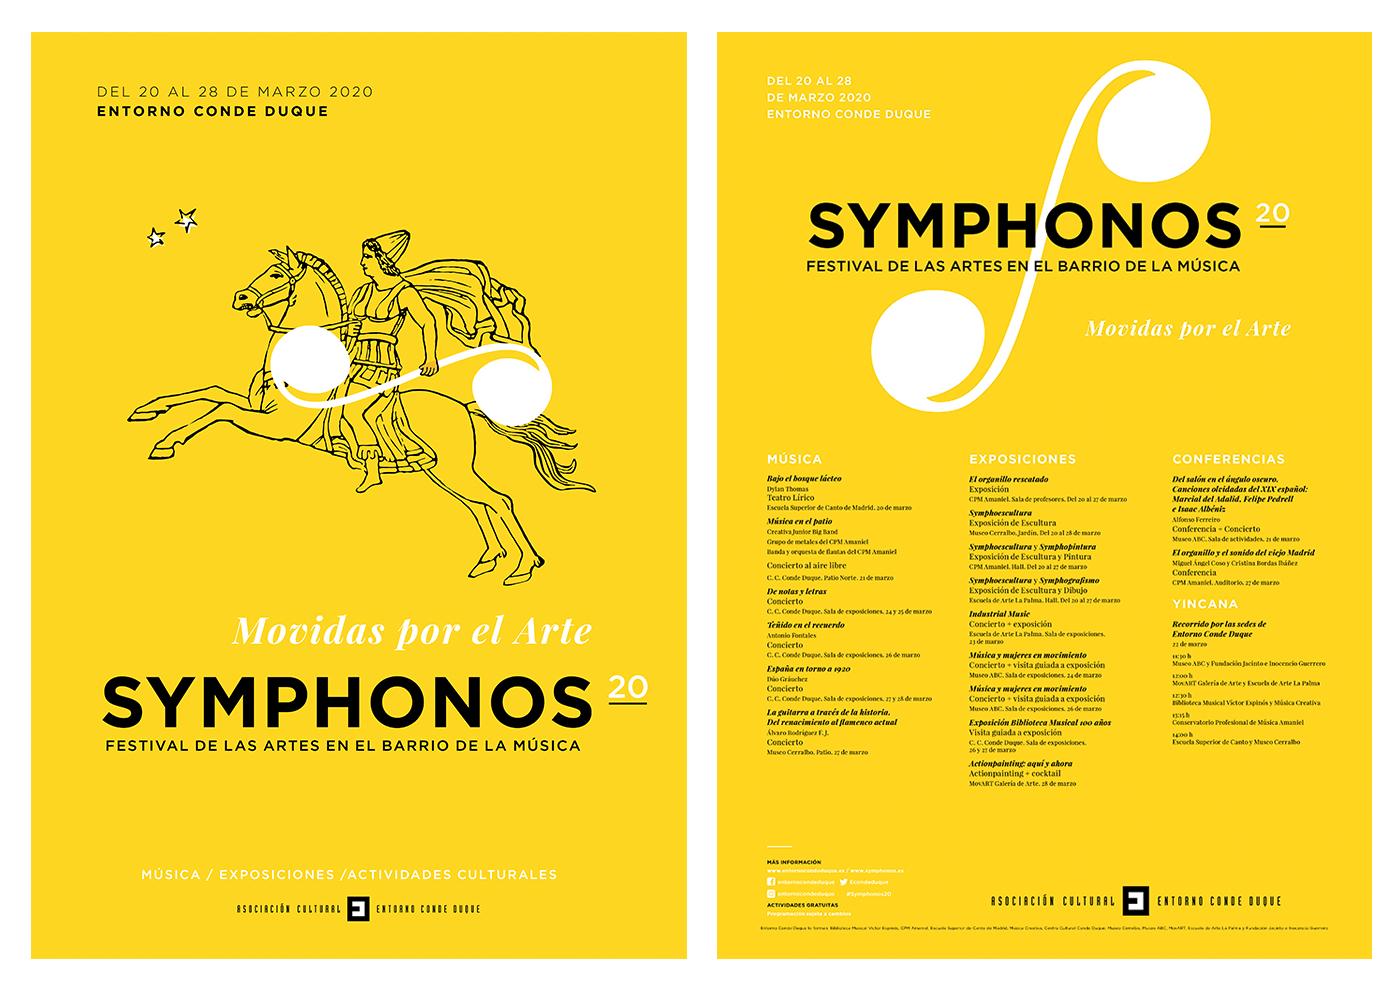 comp_symphonos_20.jpg